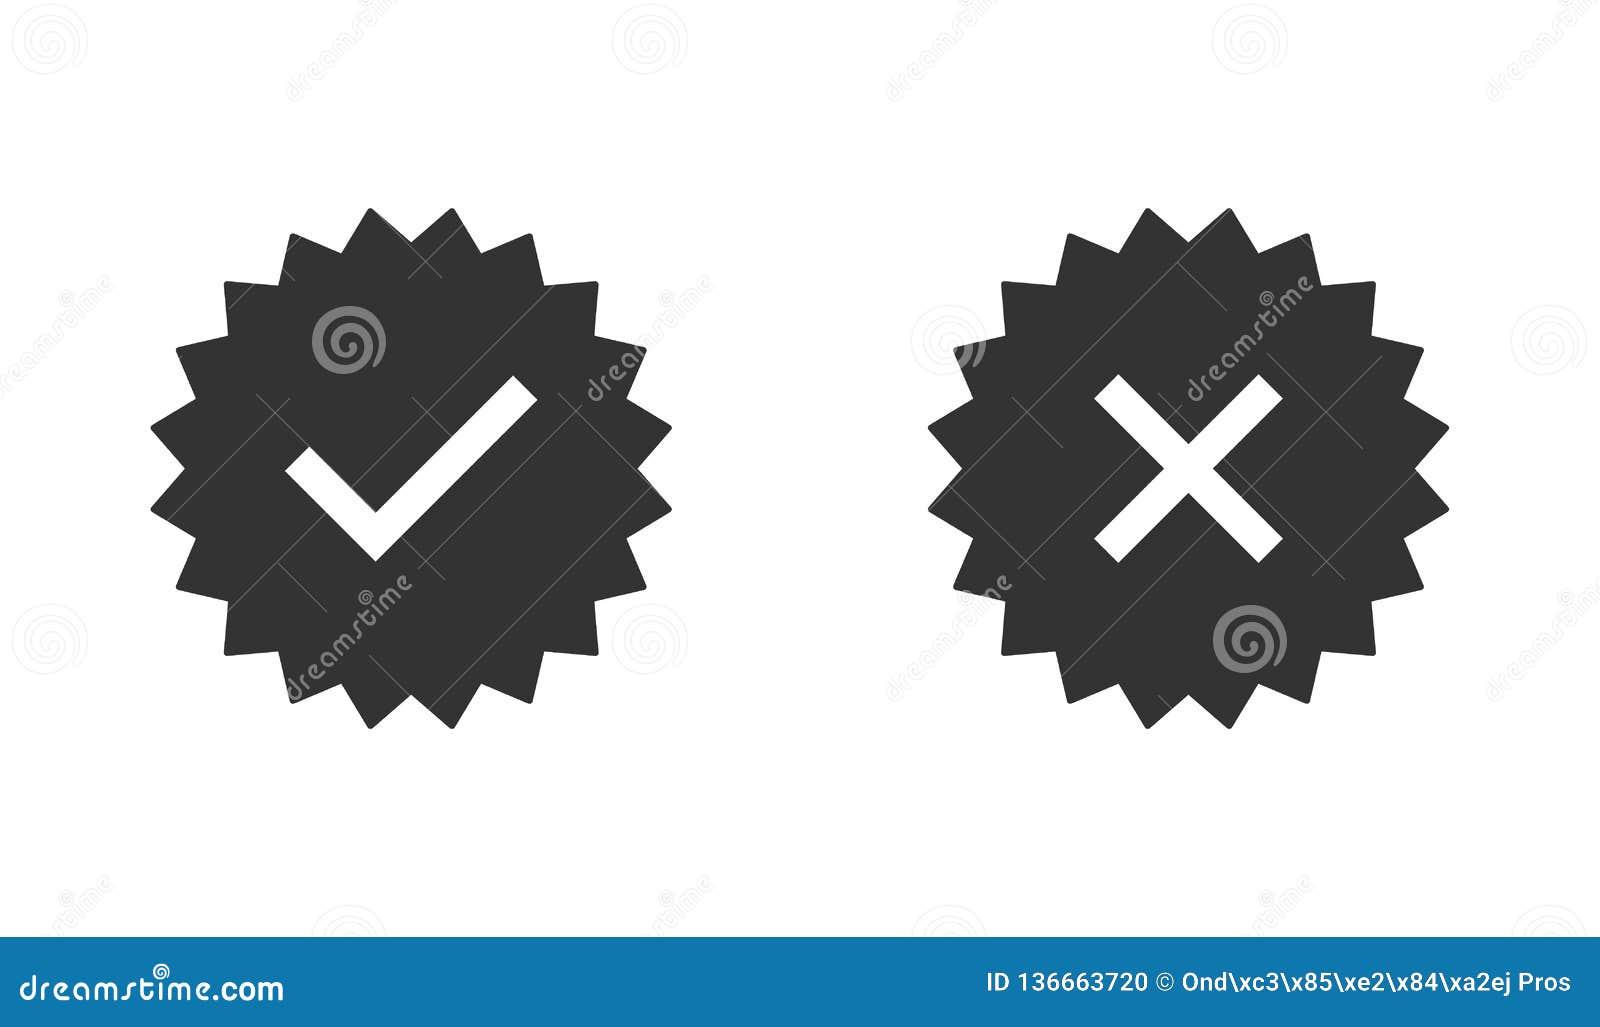 Ensemble garanti de timbre ou insigne vérifié Timbre vérifié d icône